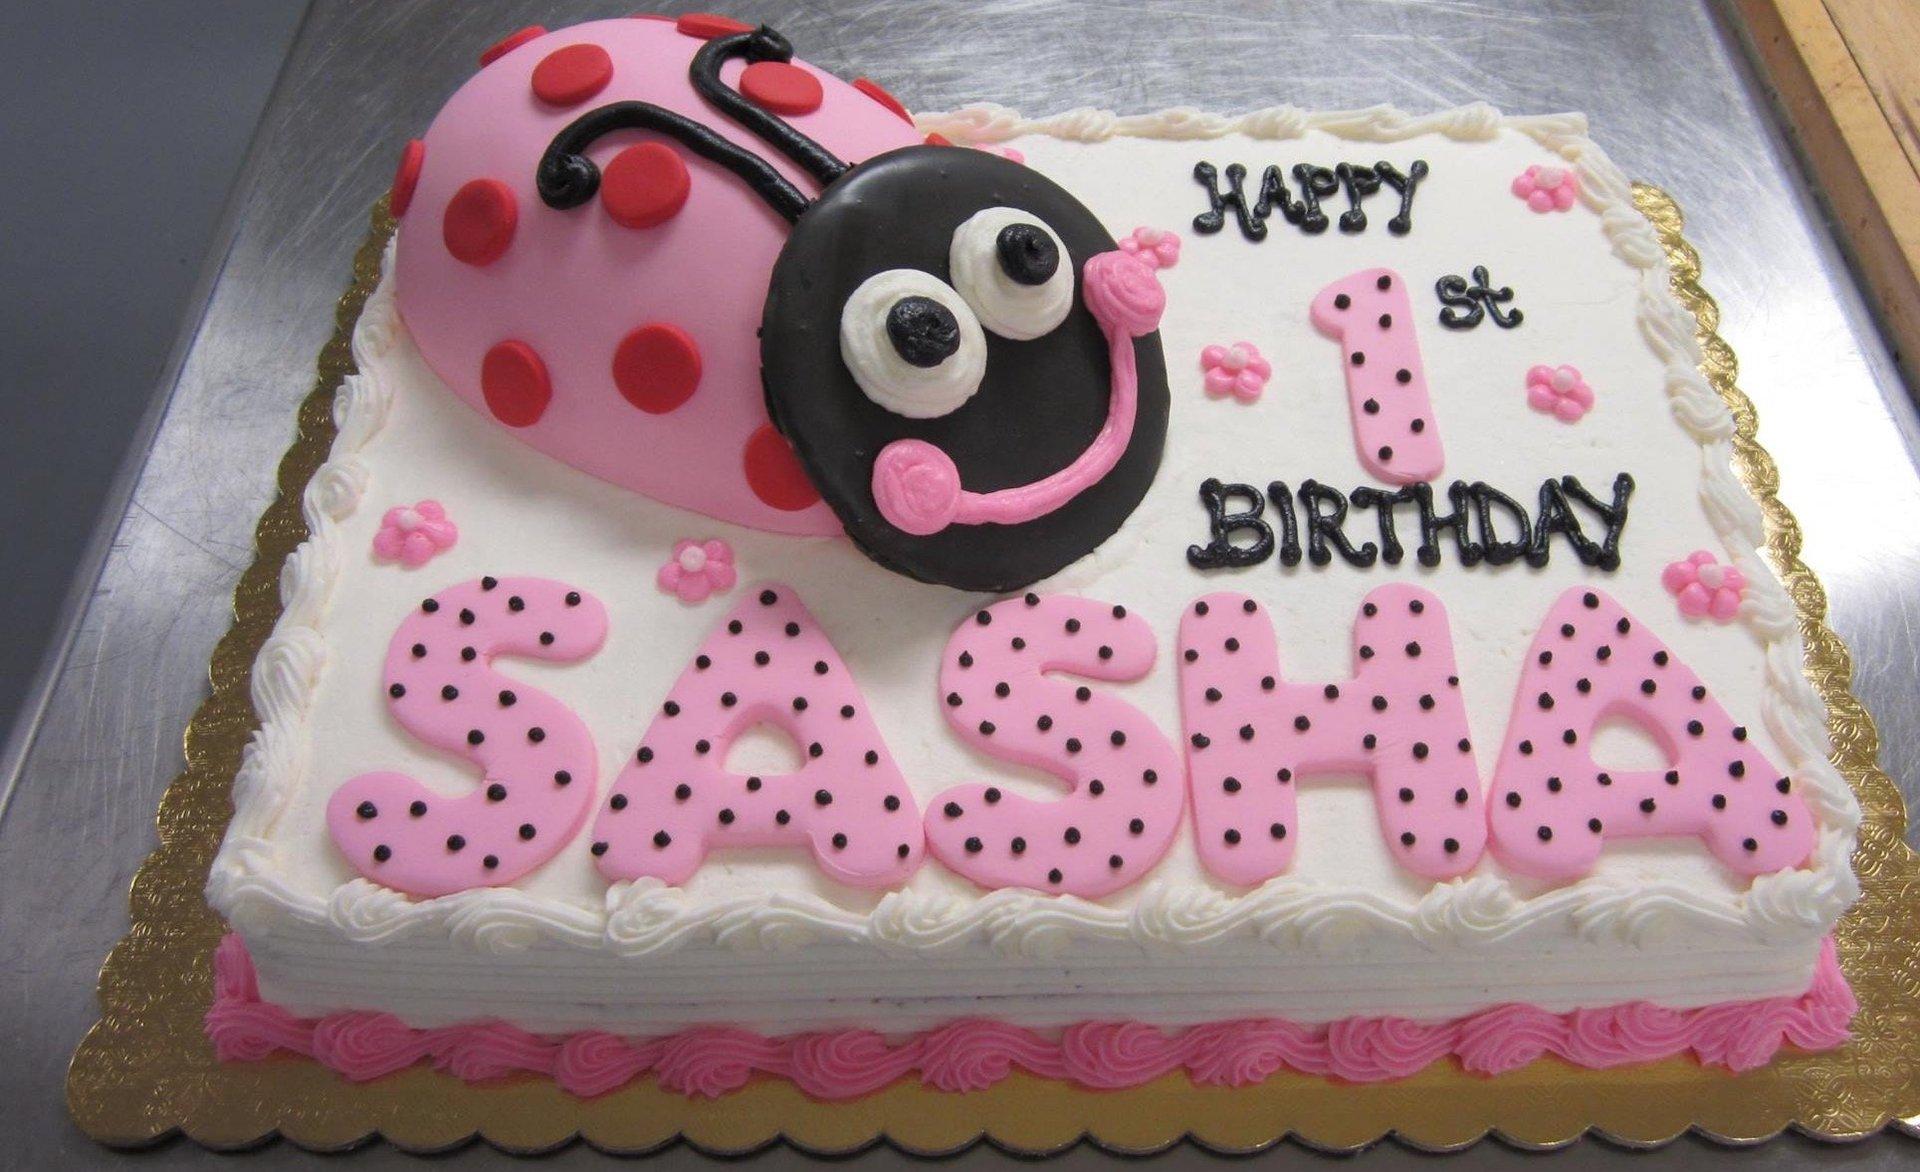 Reginas Bay Bakery Birthday Cakes Gallery Whitefish WI